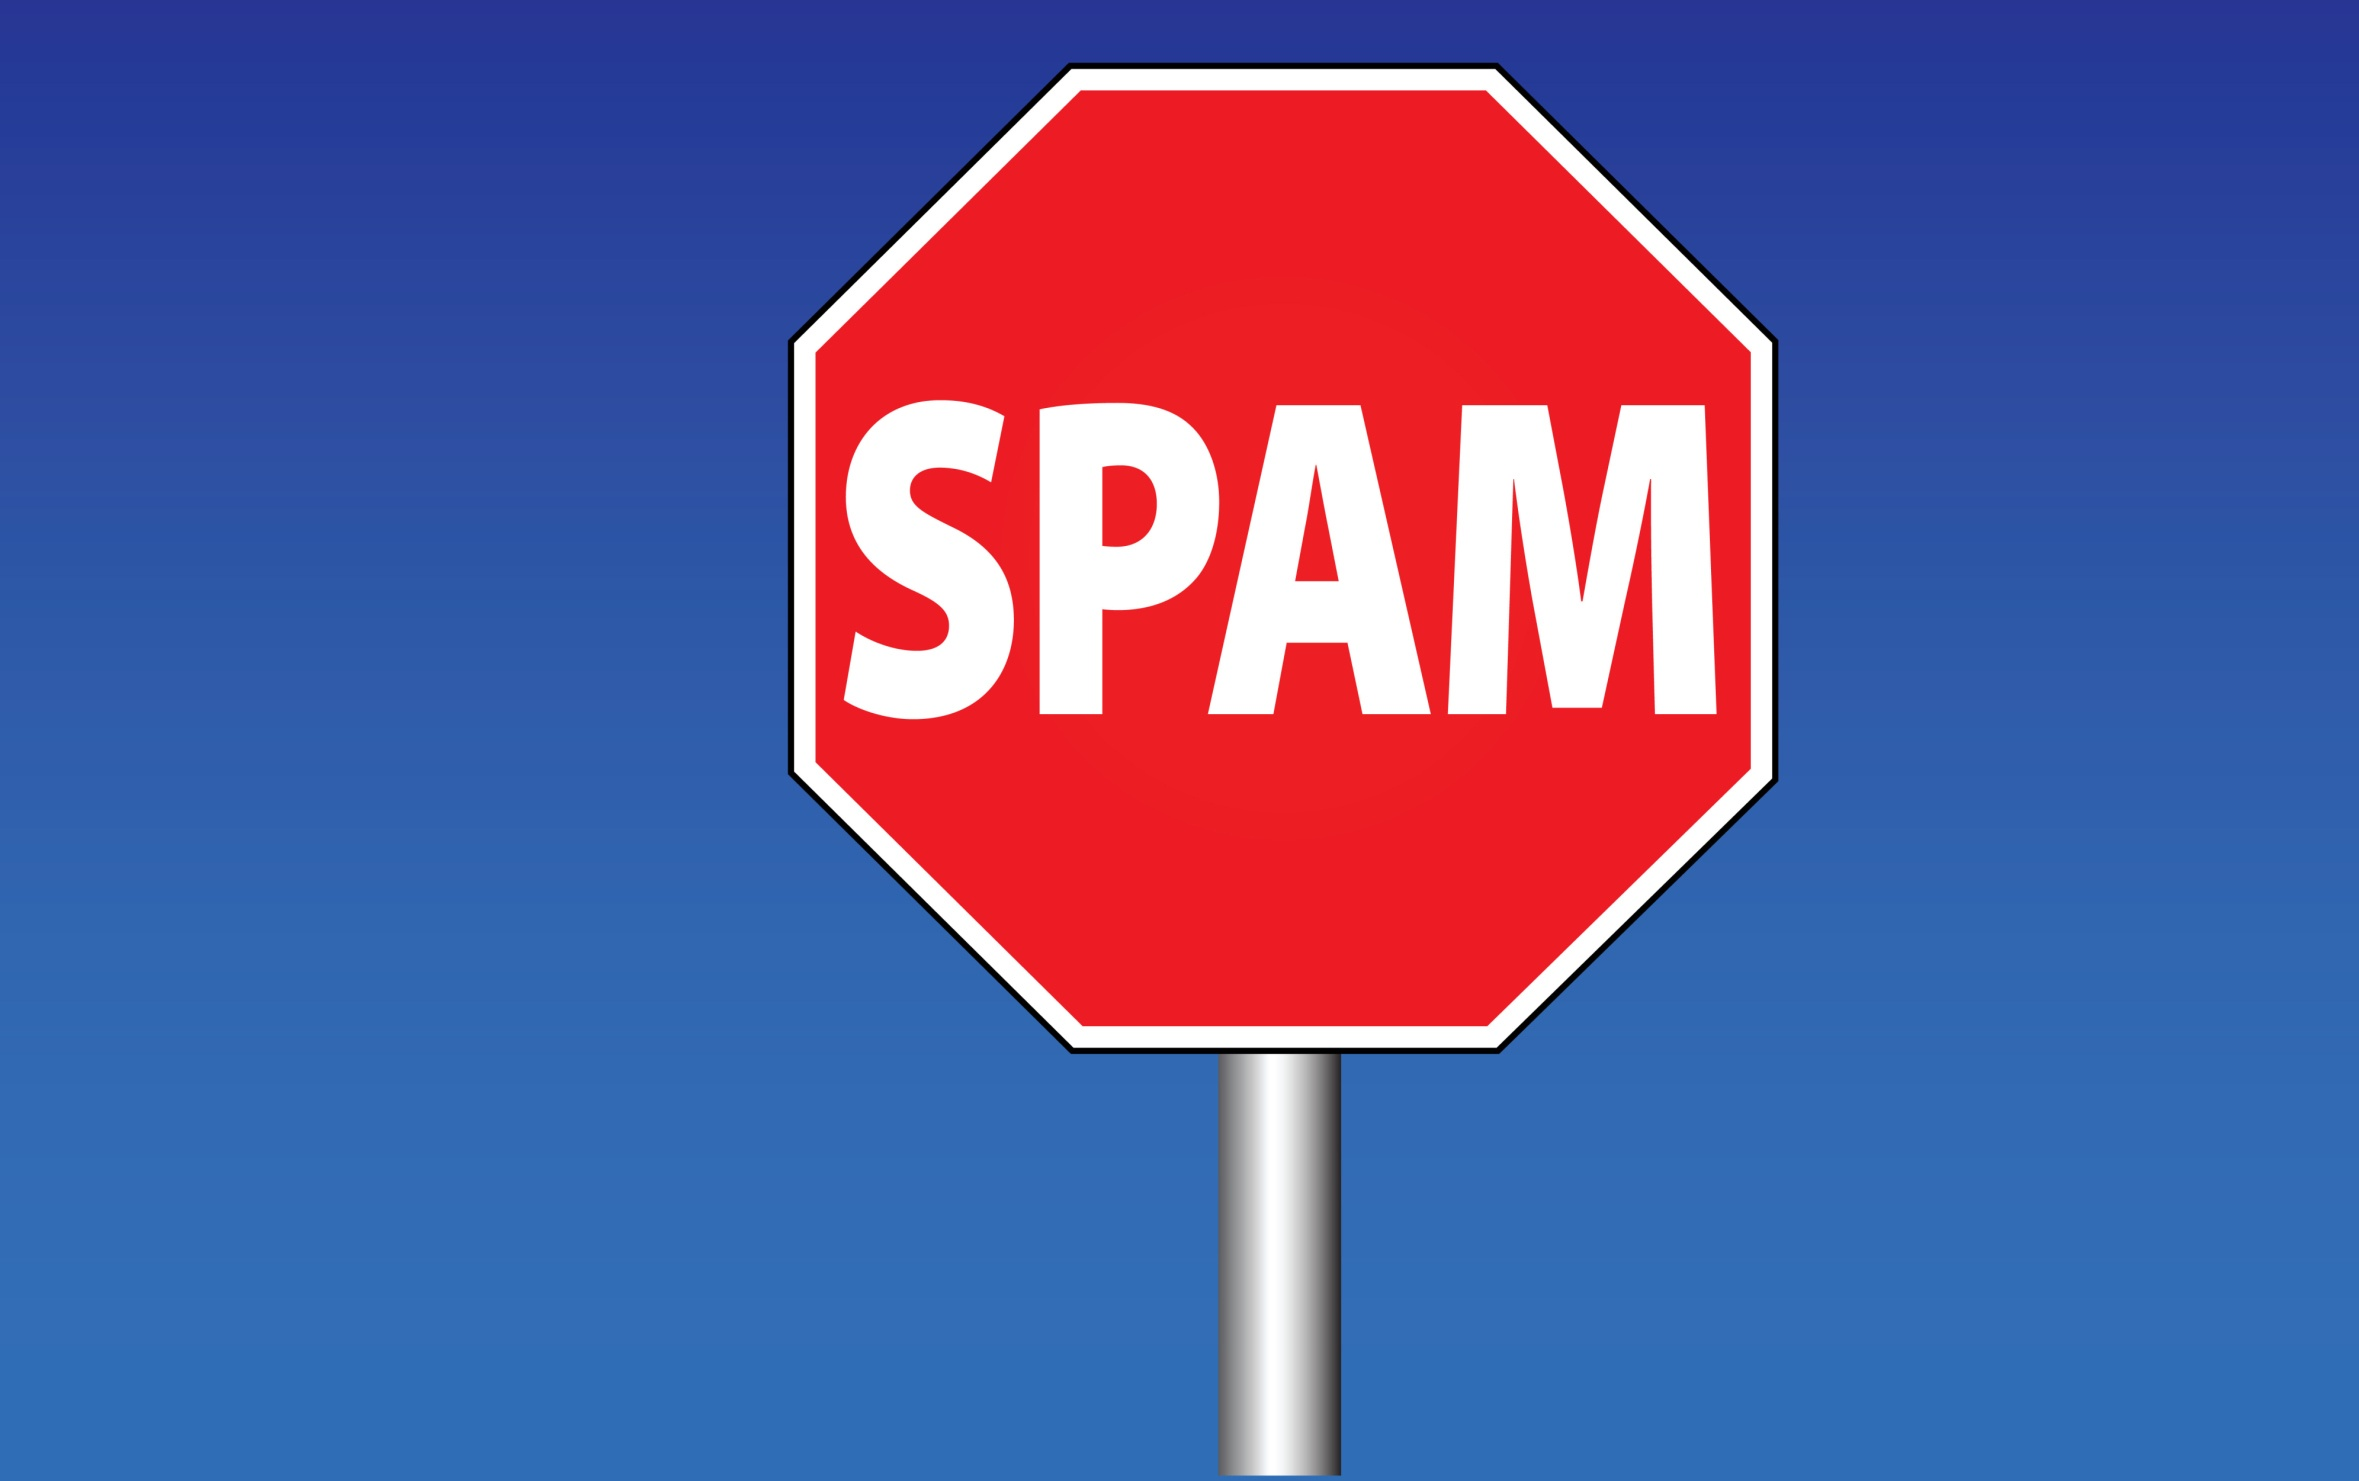 no-spam-stop-sign.jpg